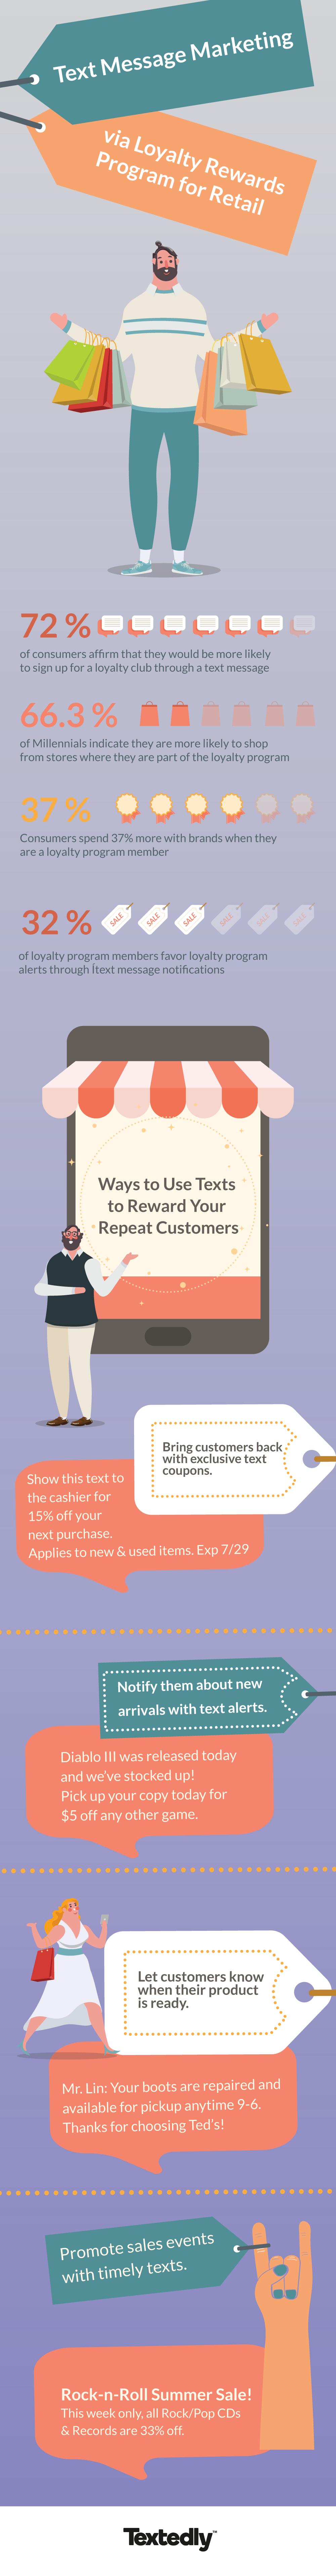 sms marketing fo retail